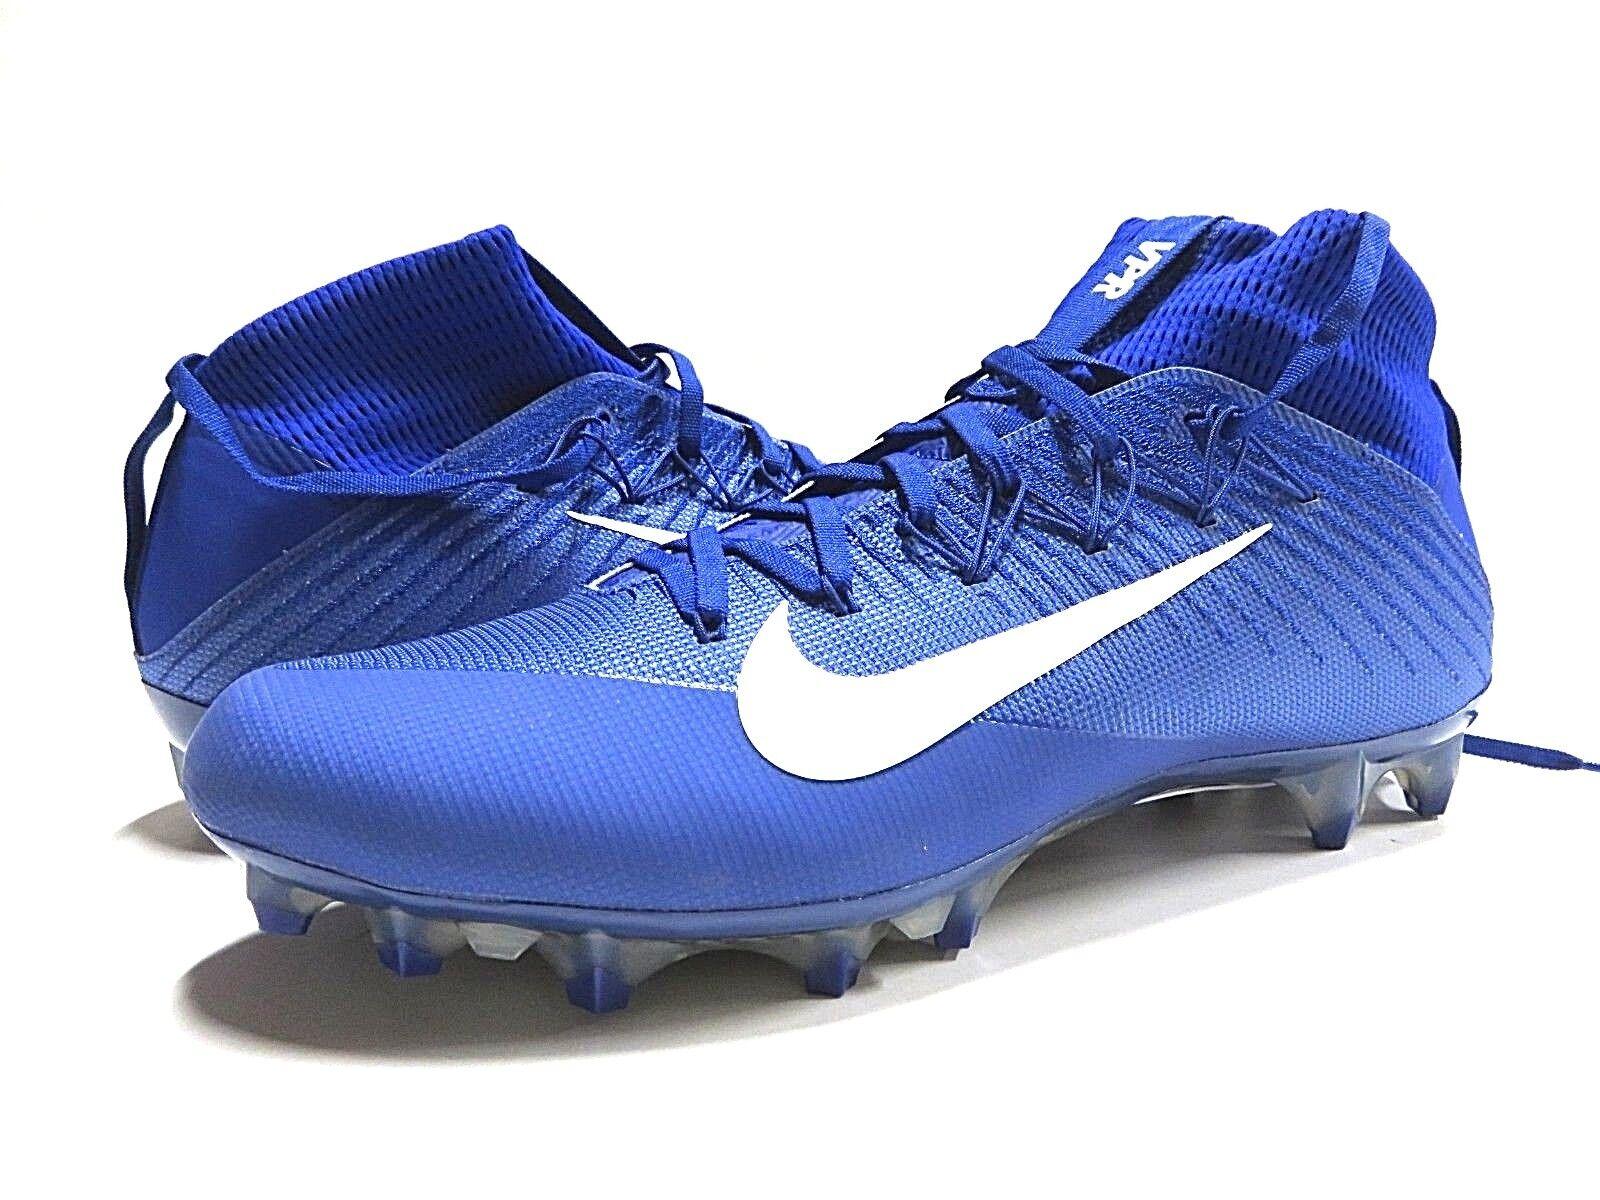 NWT Nike Vapor Untouchable 2 CF Royal bluee Football Cleats Men's Size 12.5